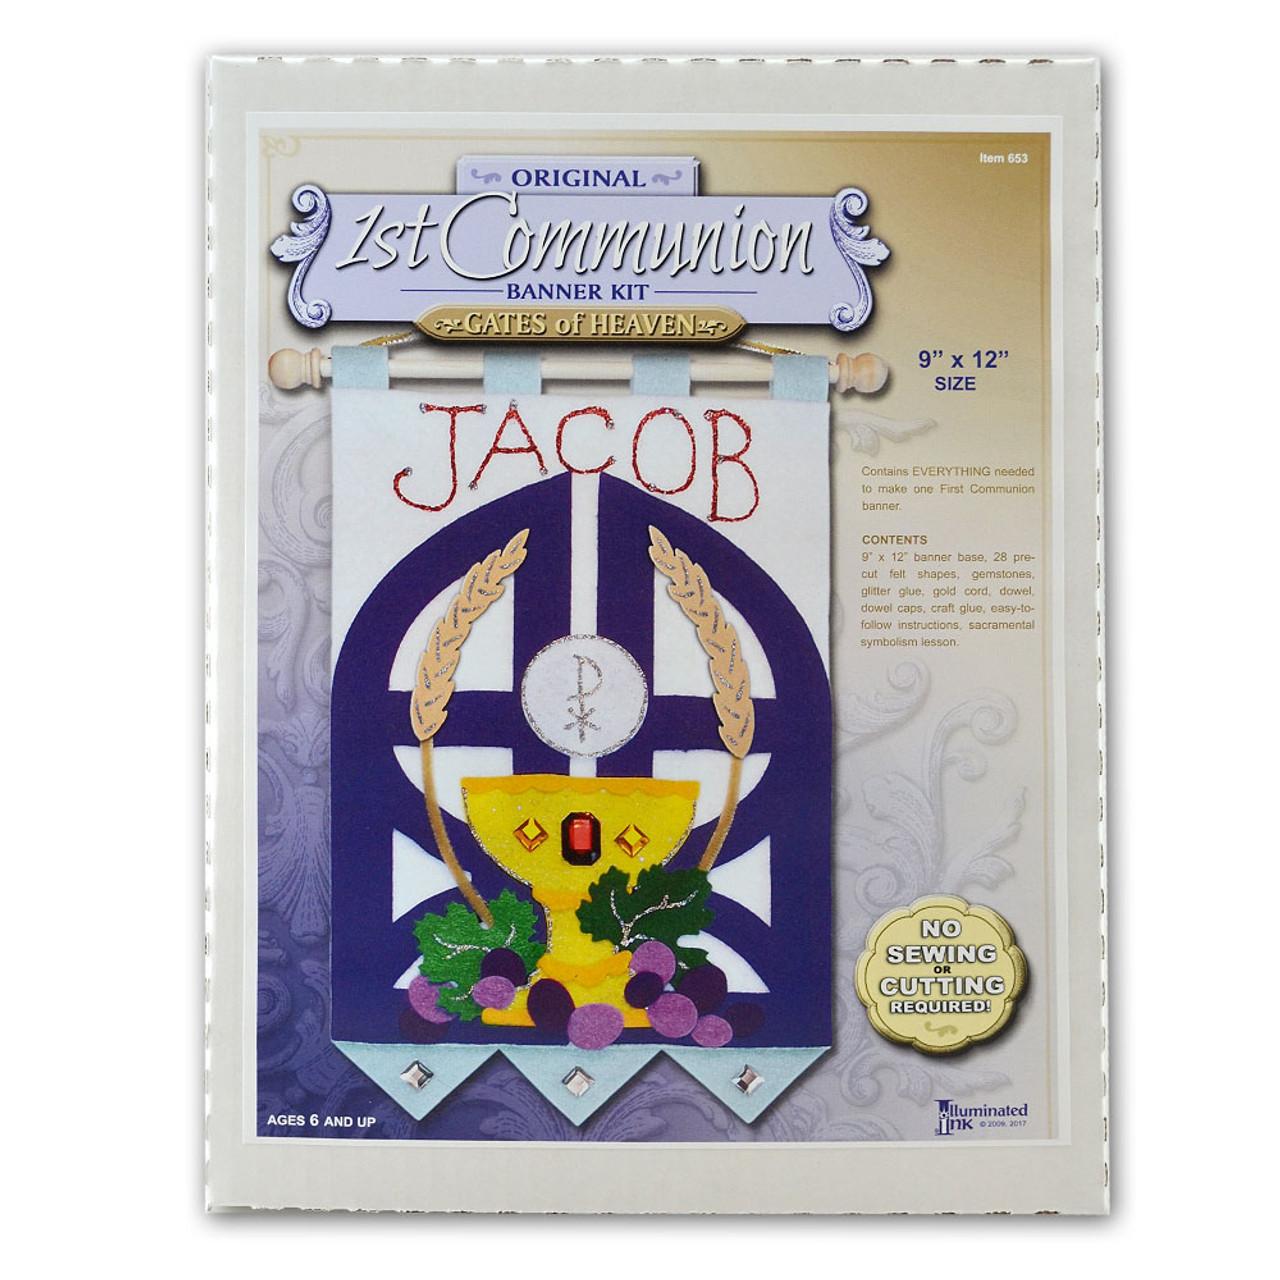 First Communion Banner Kit for Boys